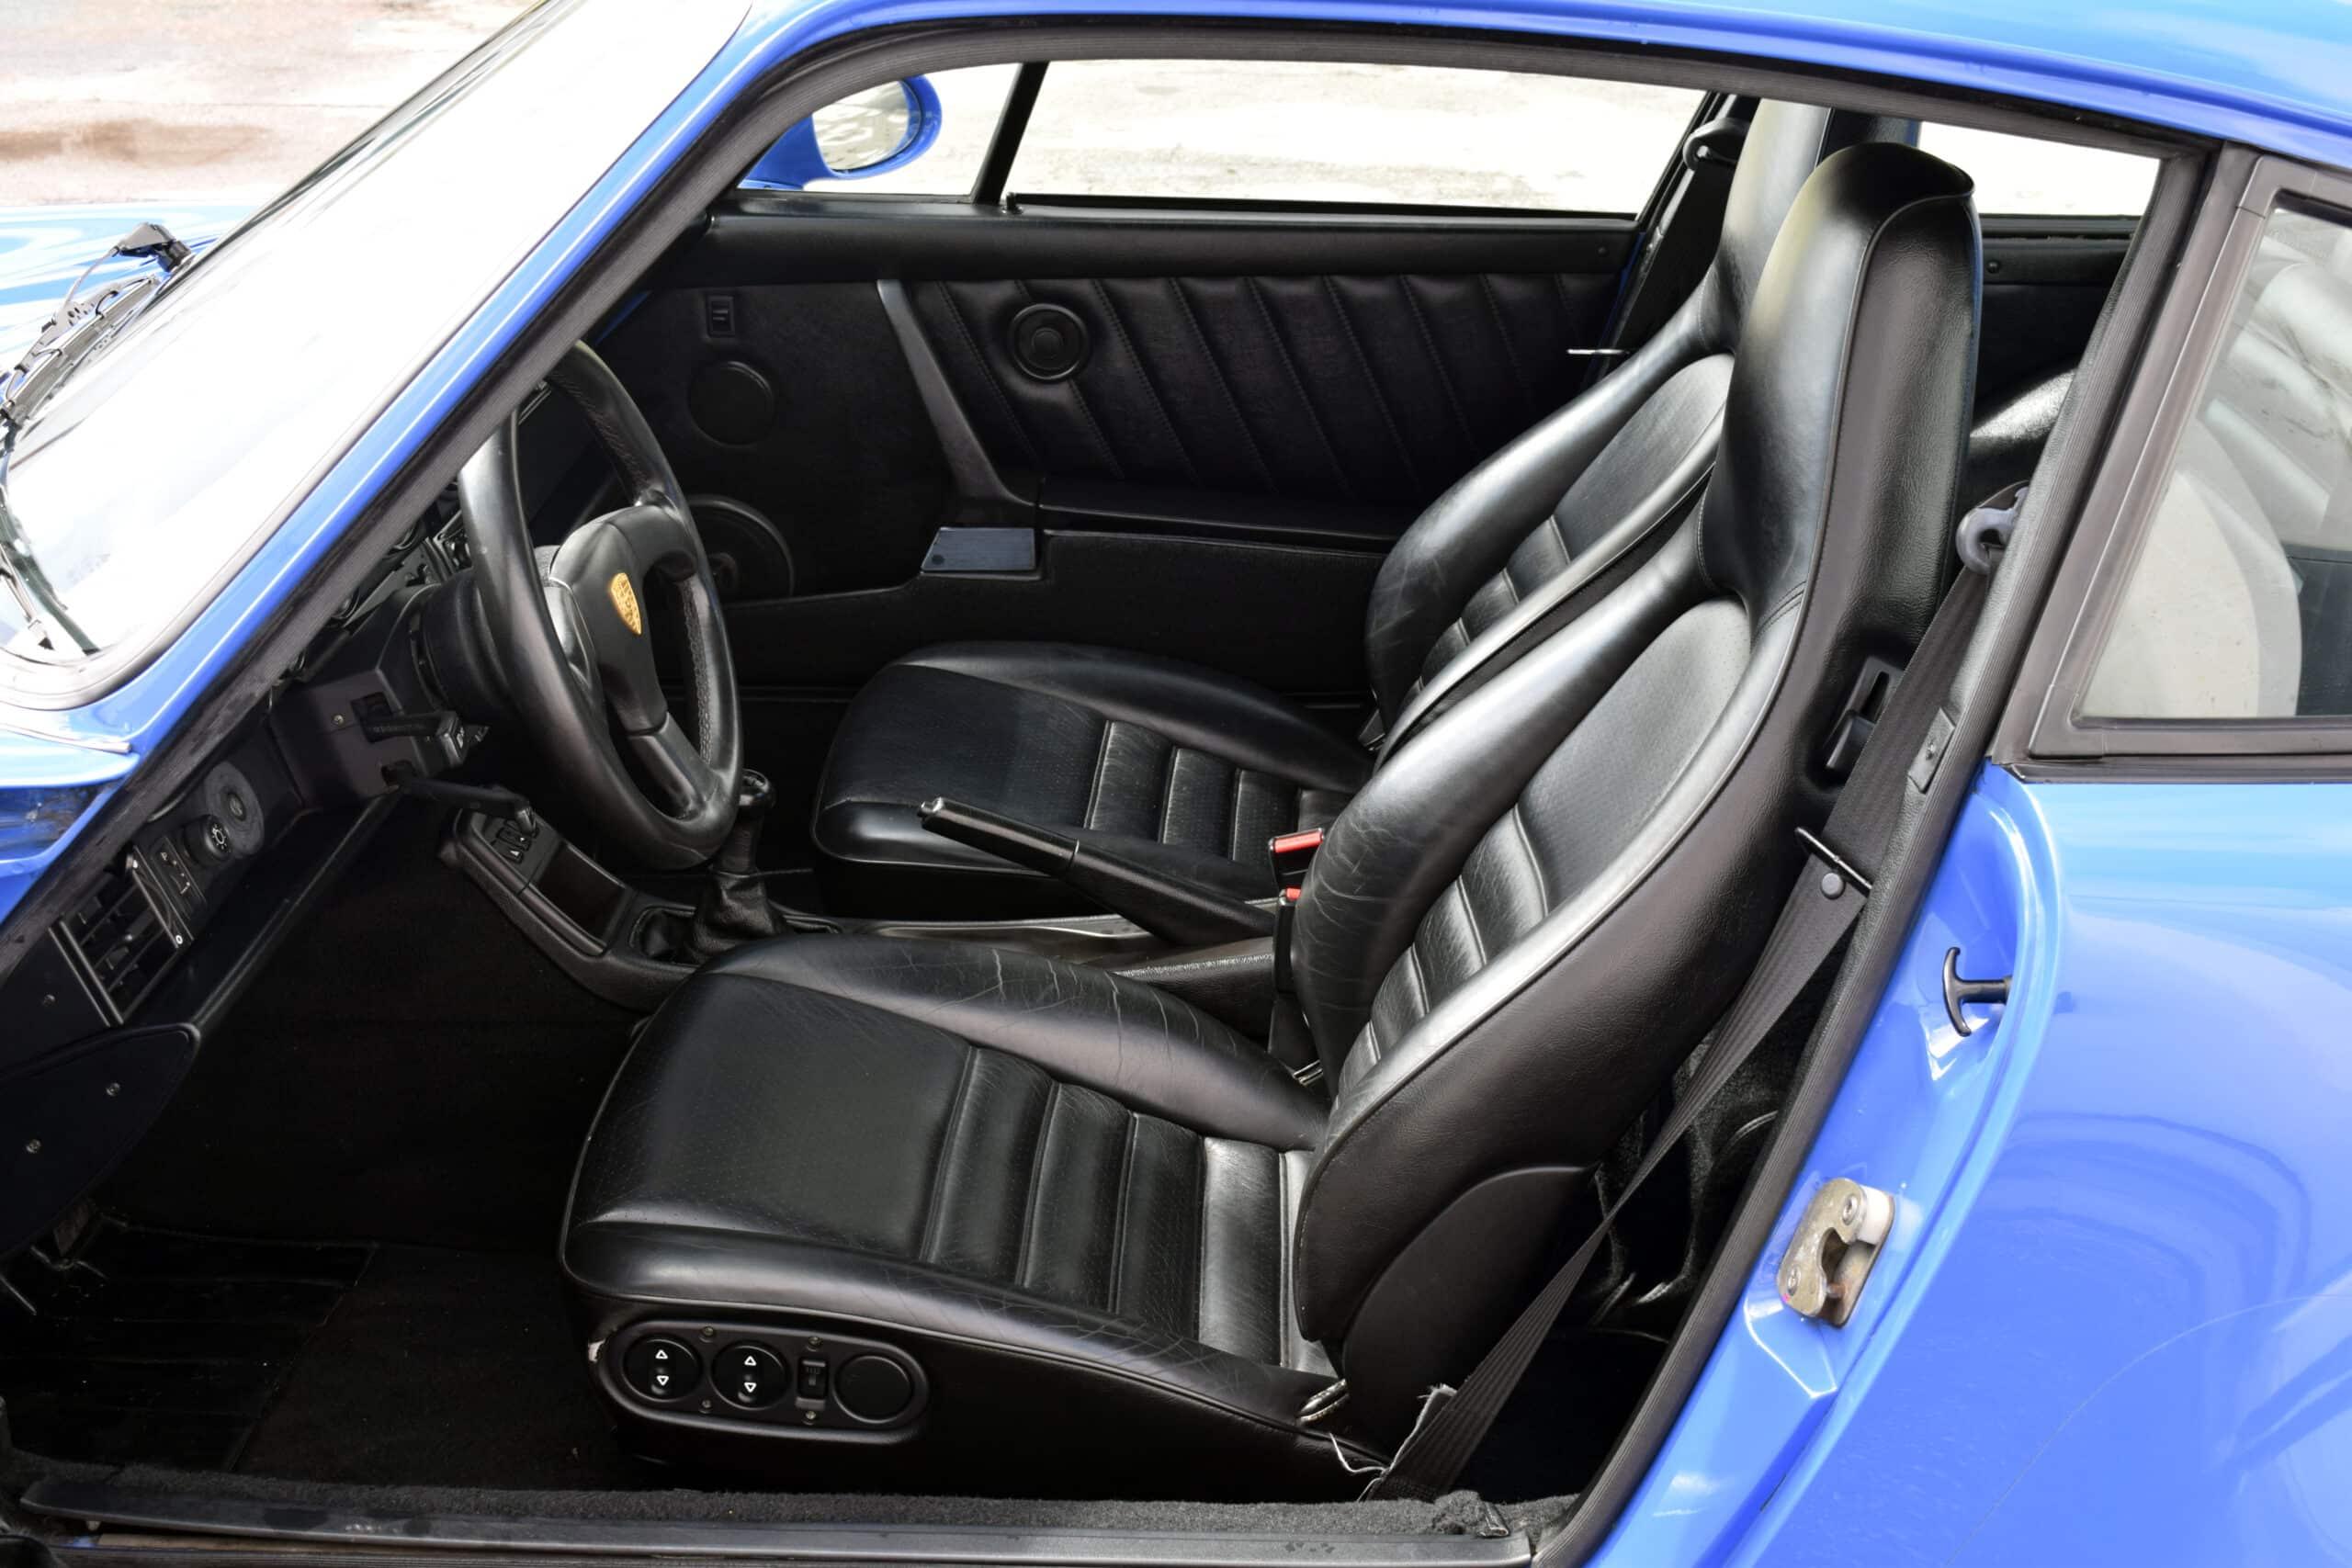 1991 Porsche 911 964 Turbo Only 49k Miles Very Rare Maritim Blue -COA- Fresh engine out service – Like New